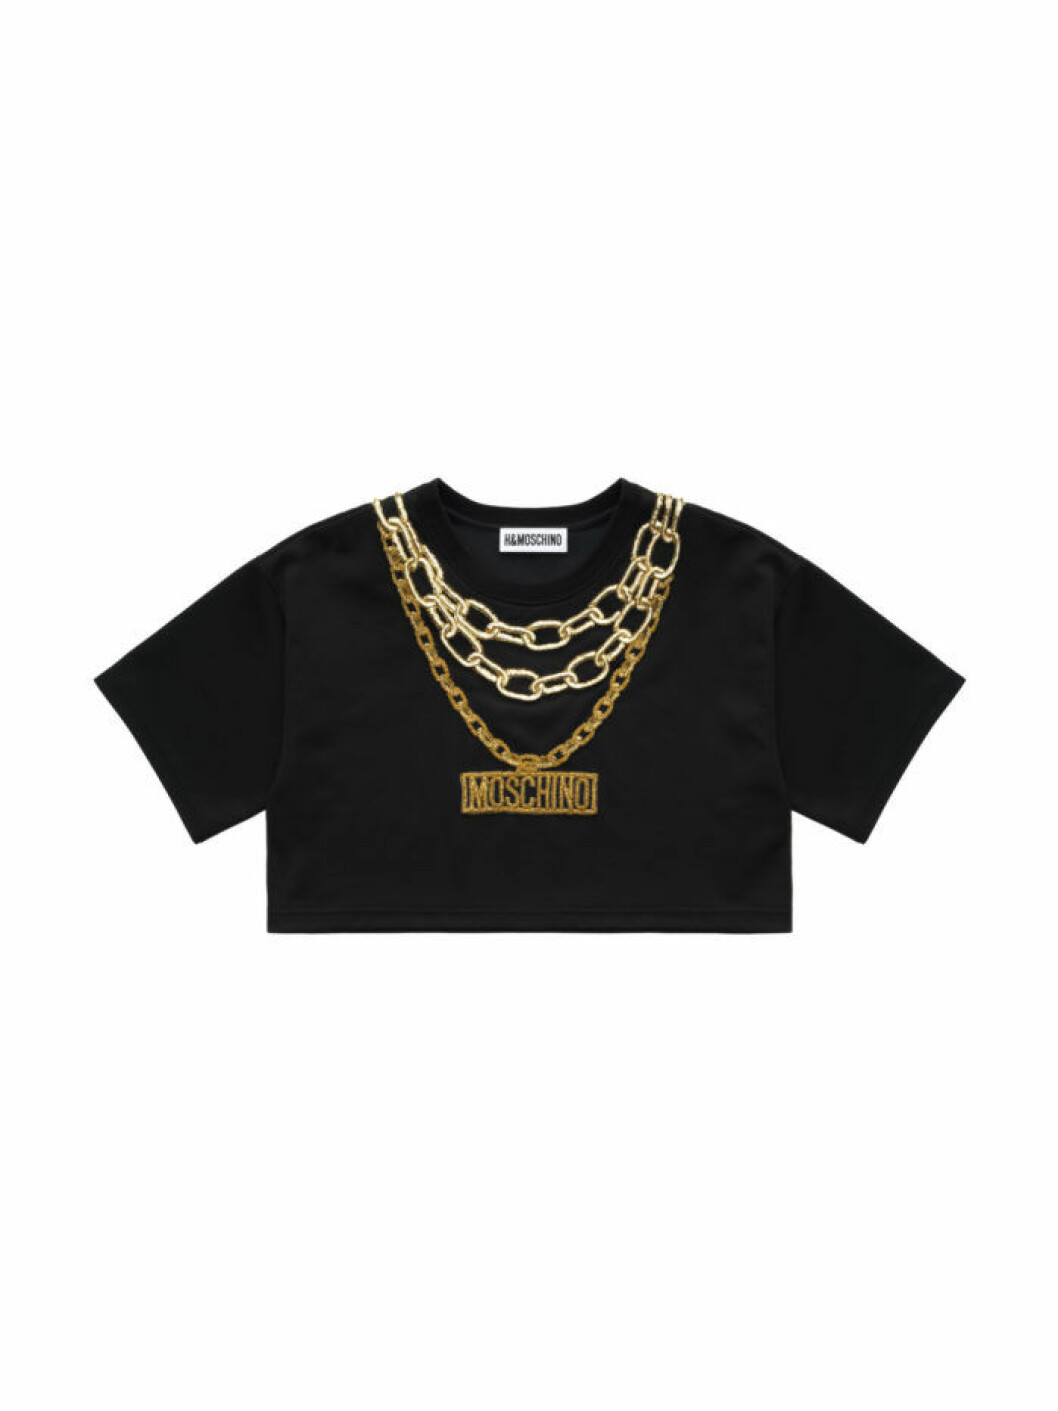 Croppad t-shirt med printade guldkedjor och Moschino-logo. Moschino H&M